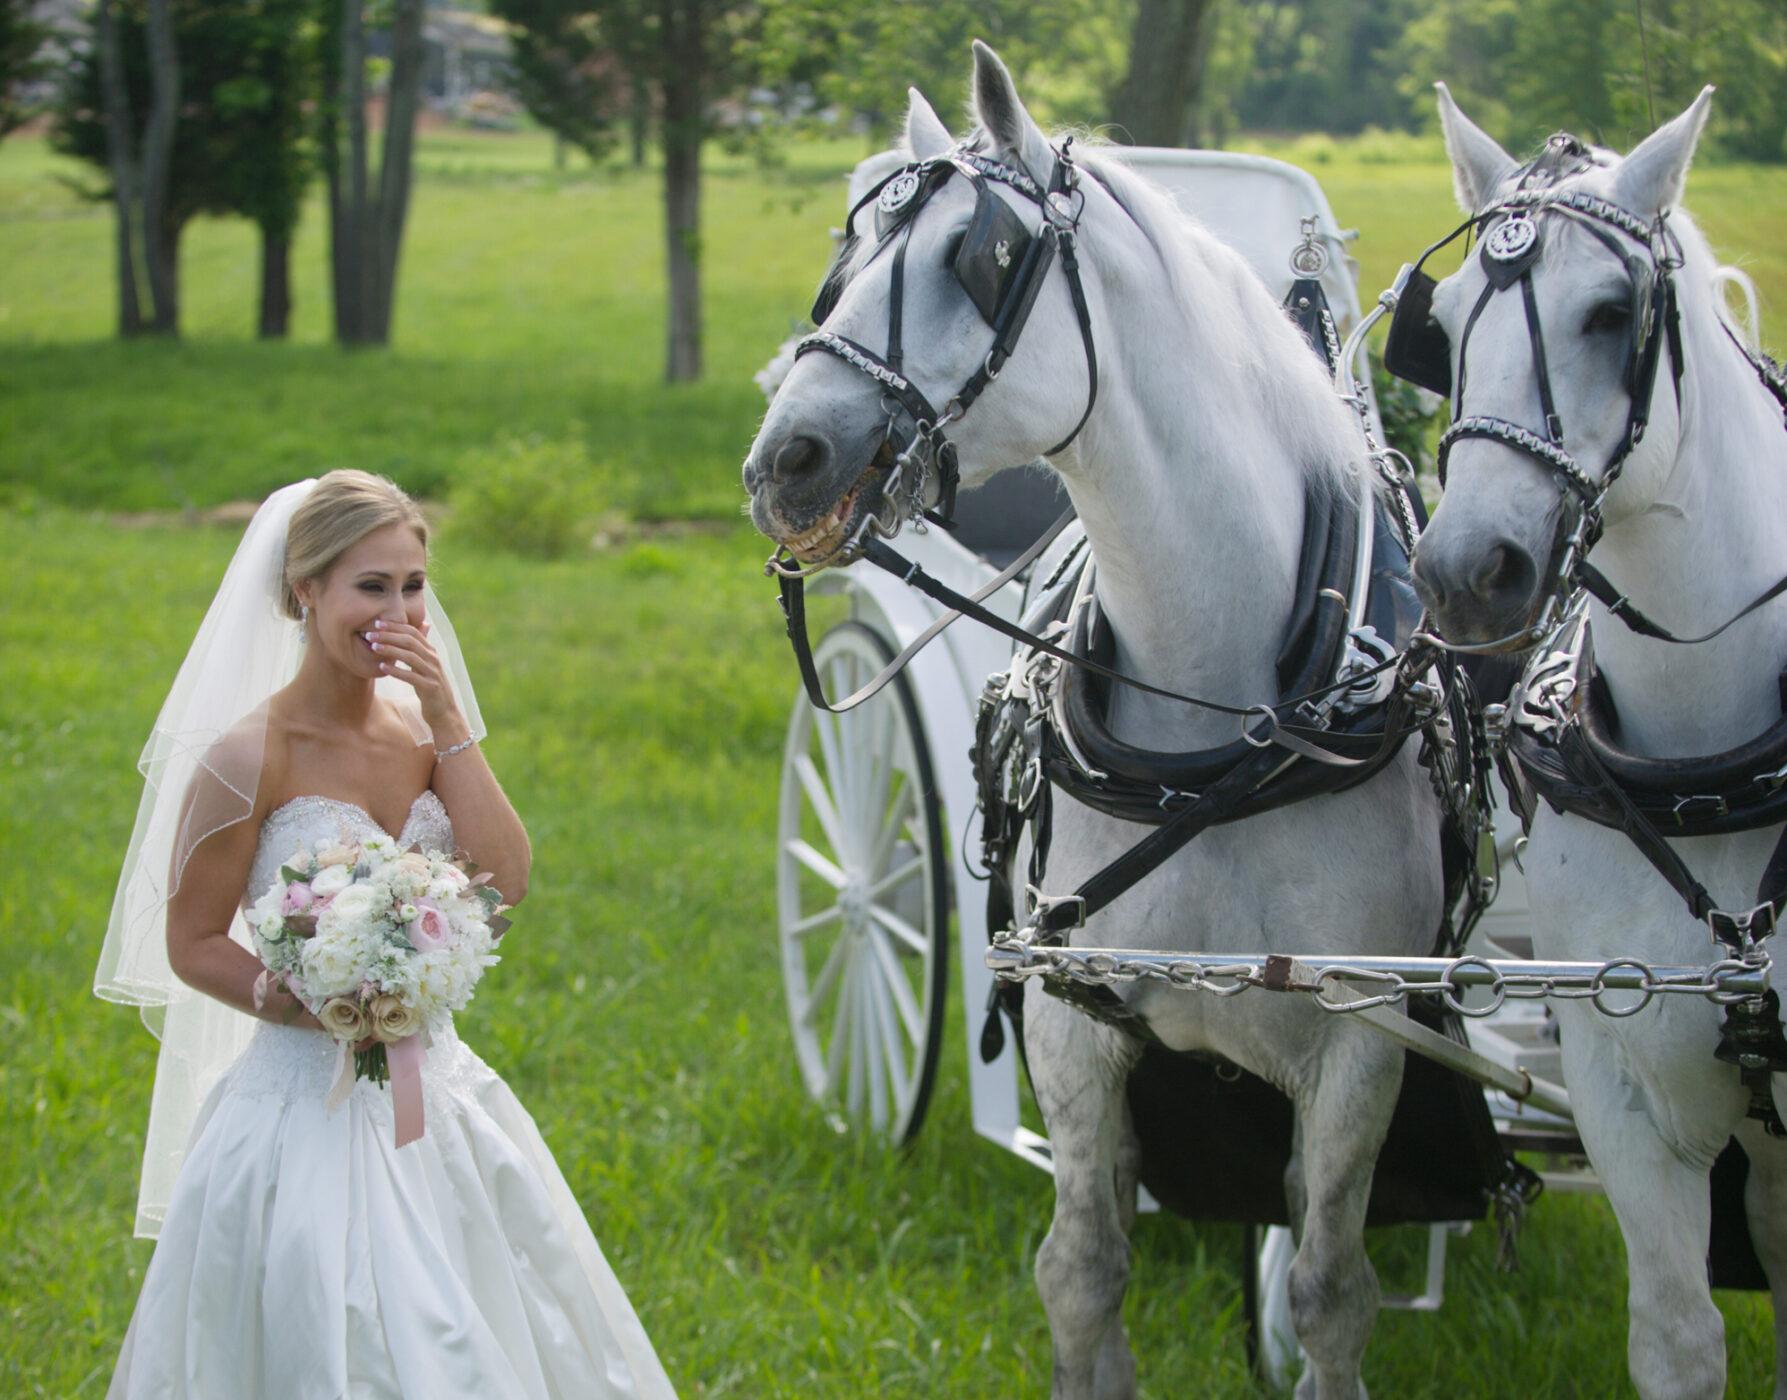 real wedding photography dc destination wedding photojournalists